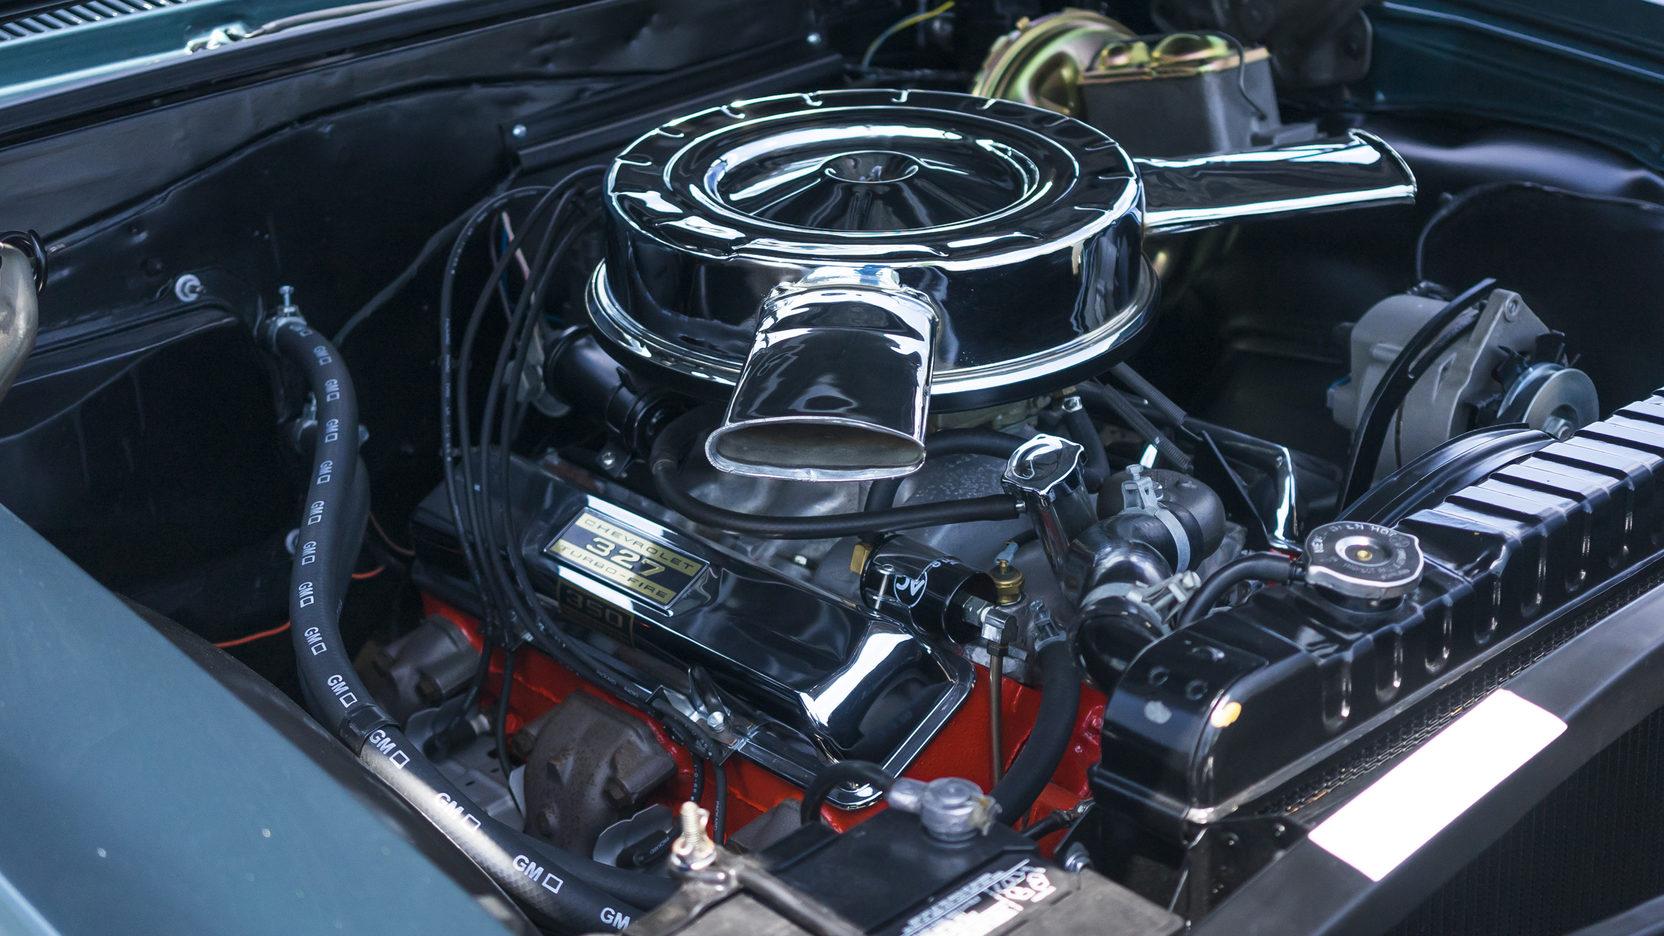 1965 Chevrolet El Camino 327 v8 engine